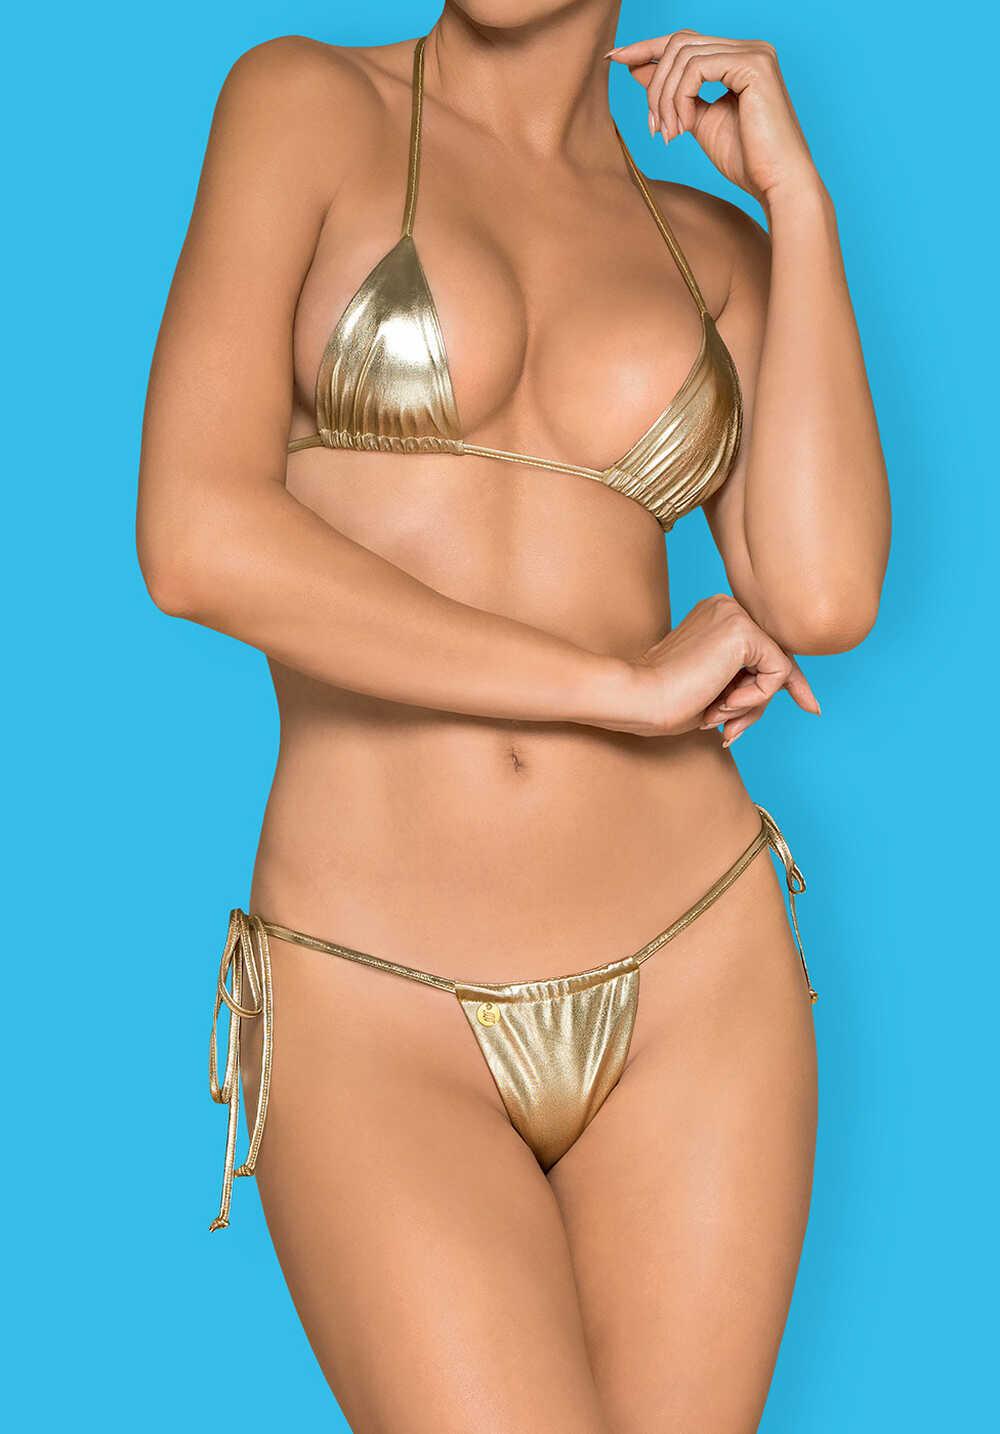 Afbeelding1 Artikel: Micro Bikini goud Variant: 1132 Parent:  Datum: 05/06/2020 19:11:23